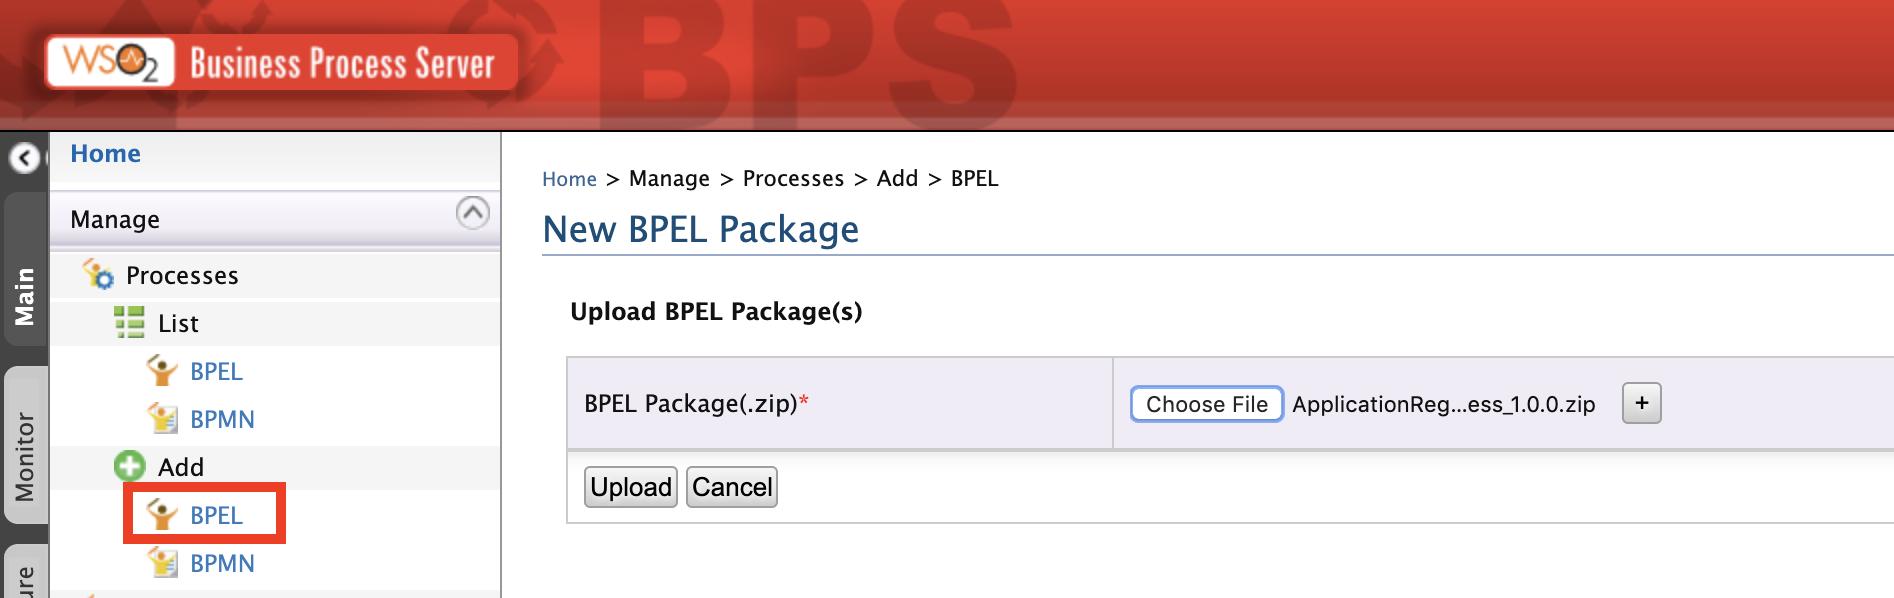 Upload BPEL package